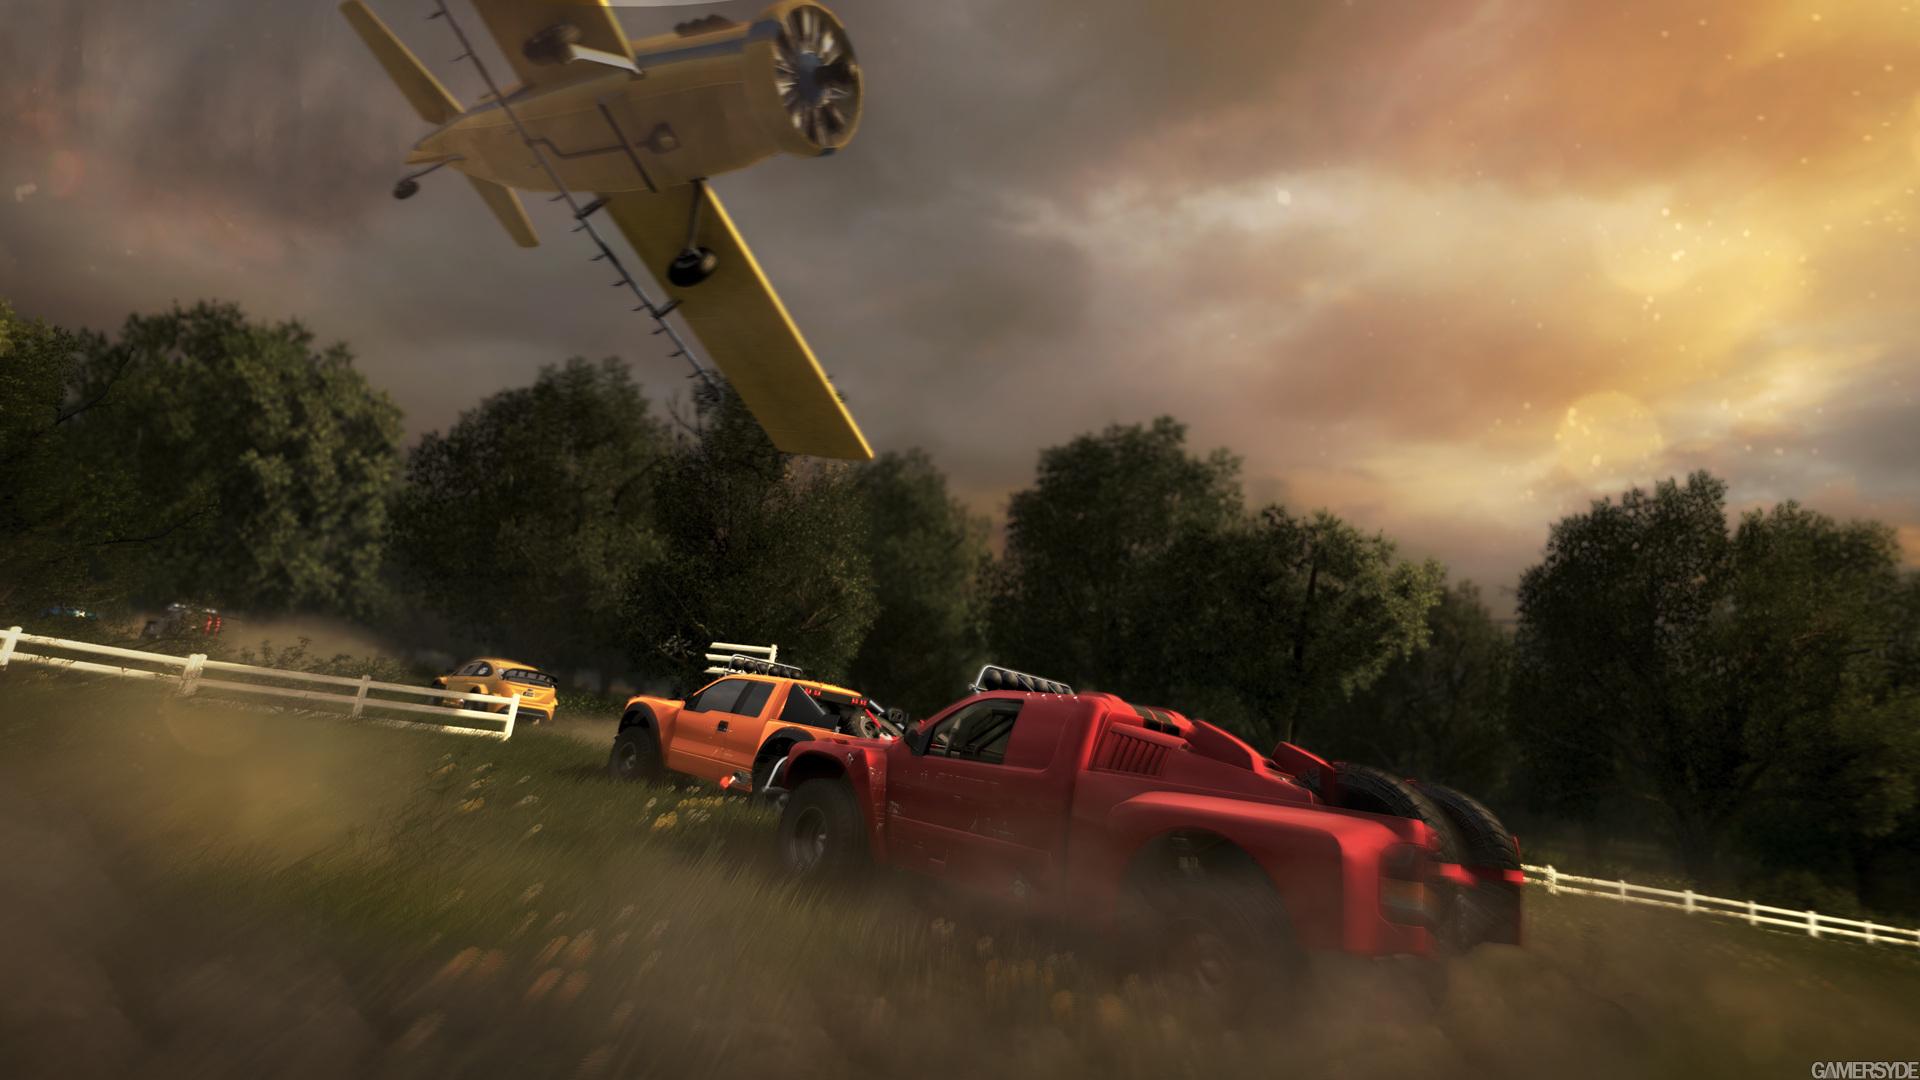 image the crew 22914 2749 0002 تصاویر جدید از عنوان The Crew منتشر شد